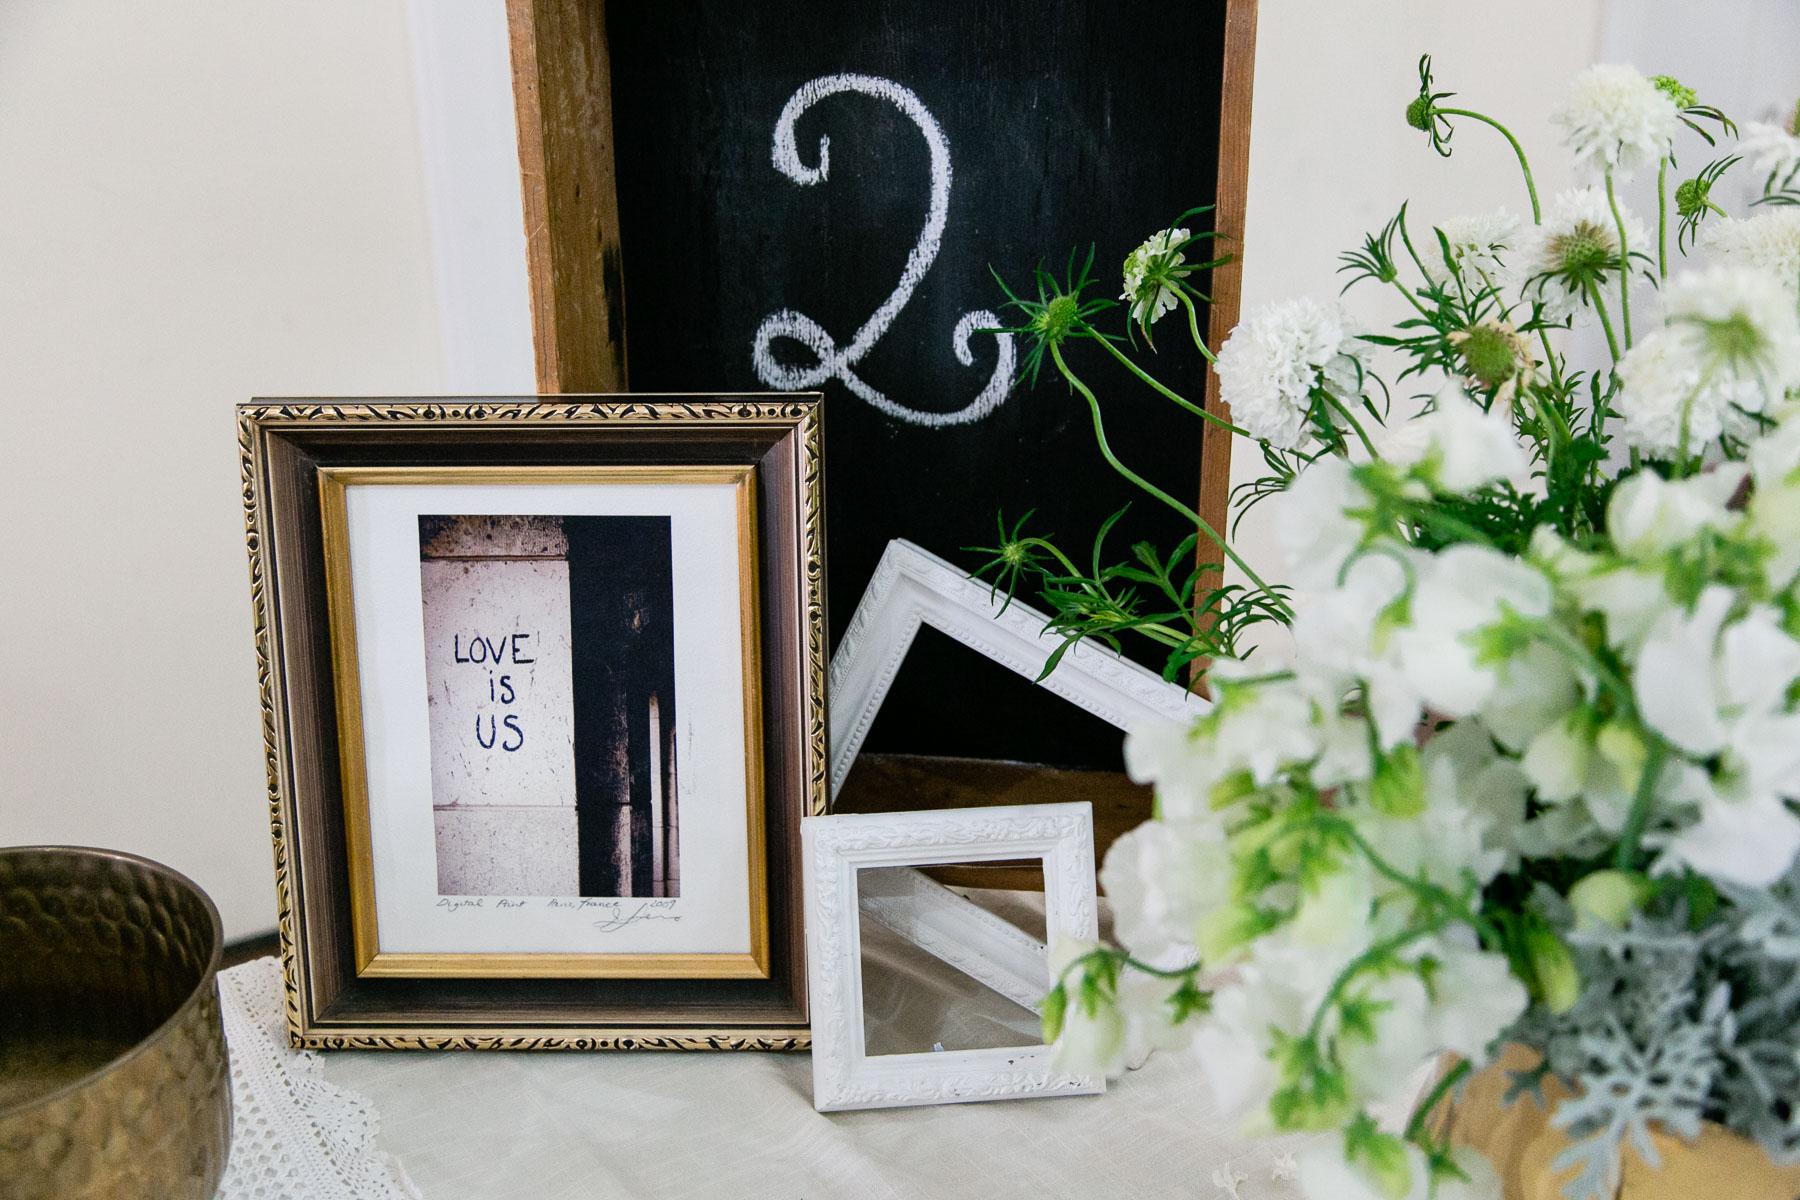 20141005-PYHII-DIY WEDDING-080.jpg